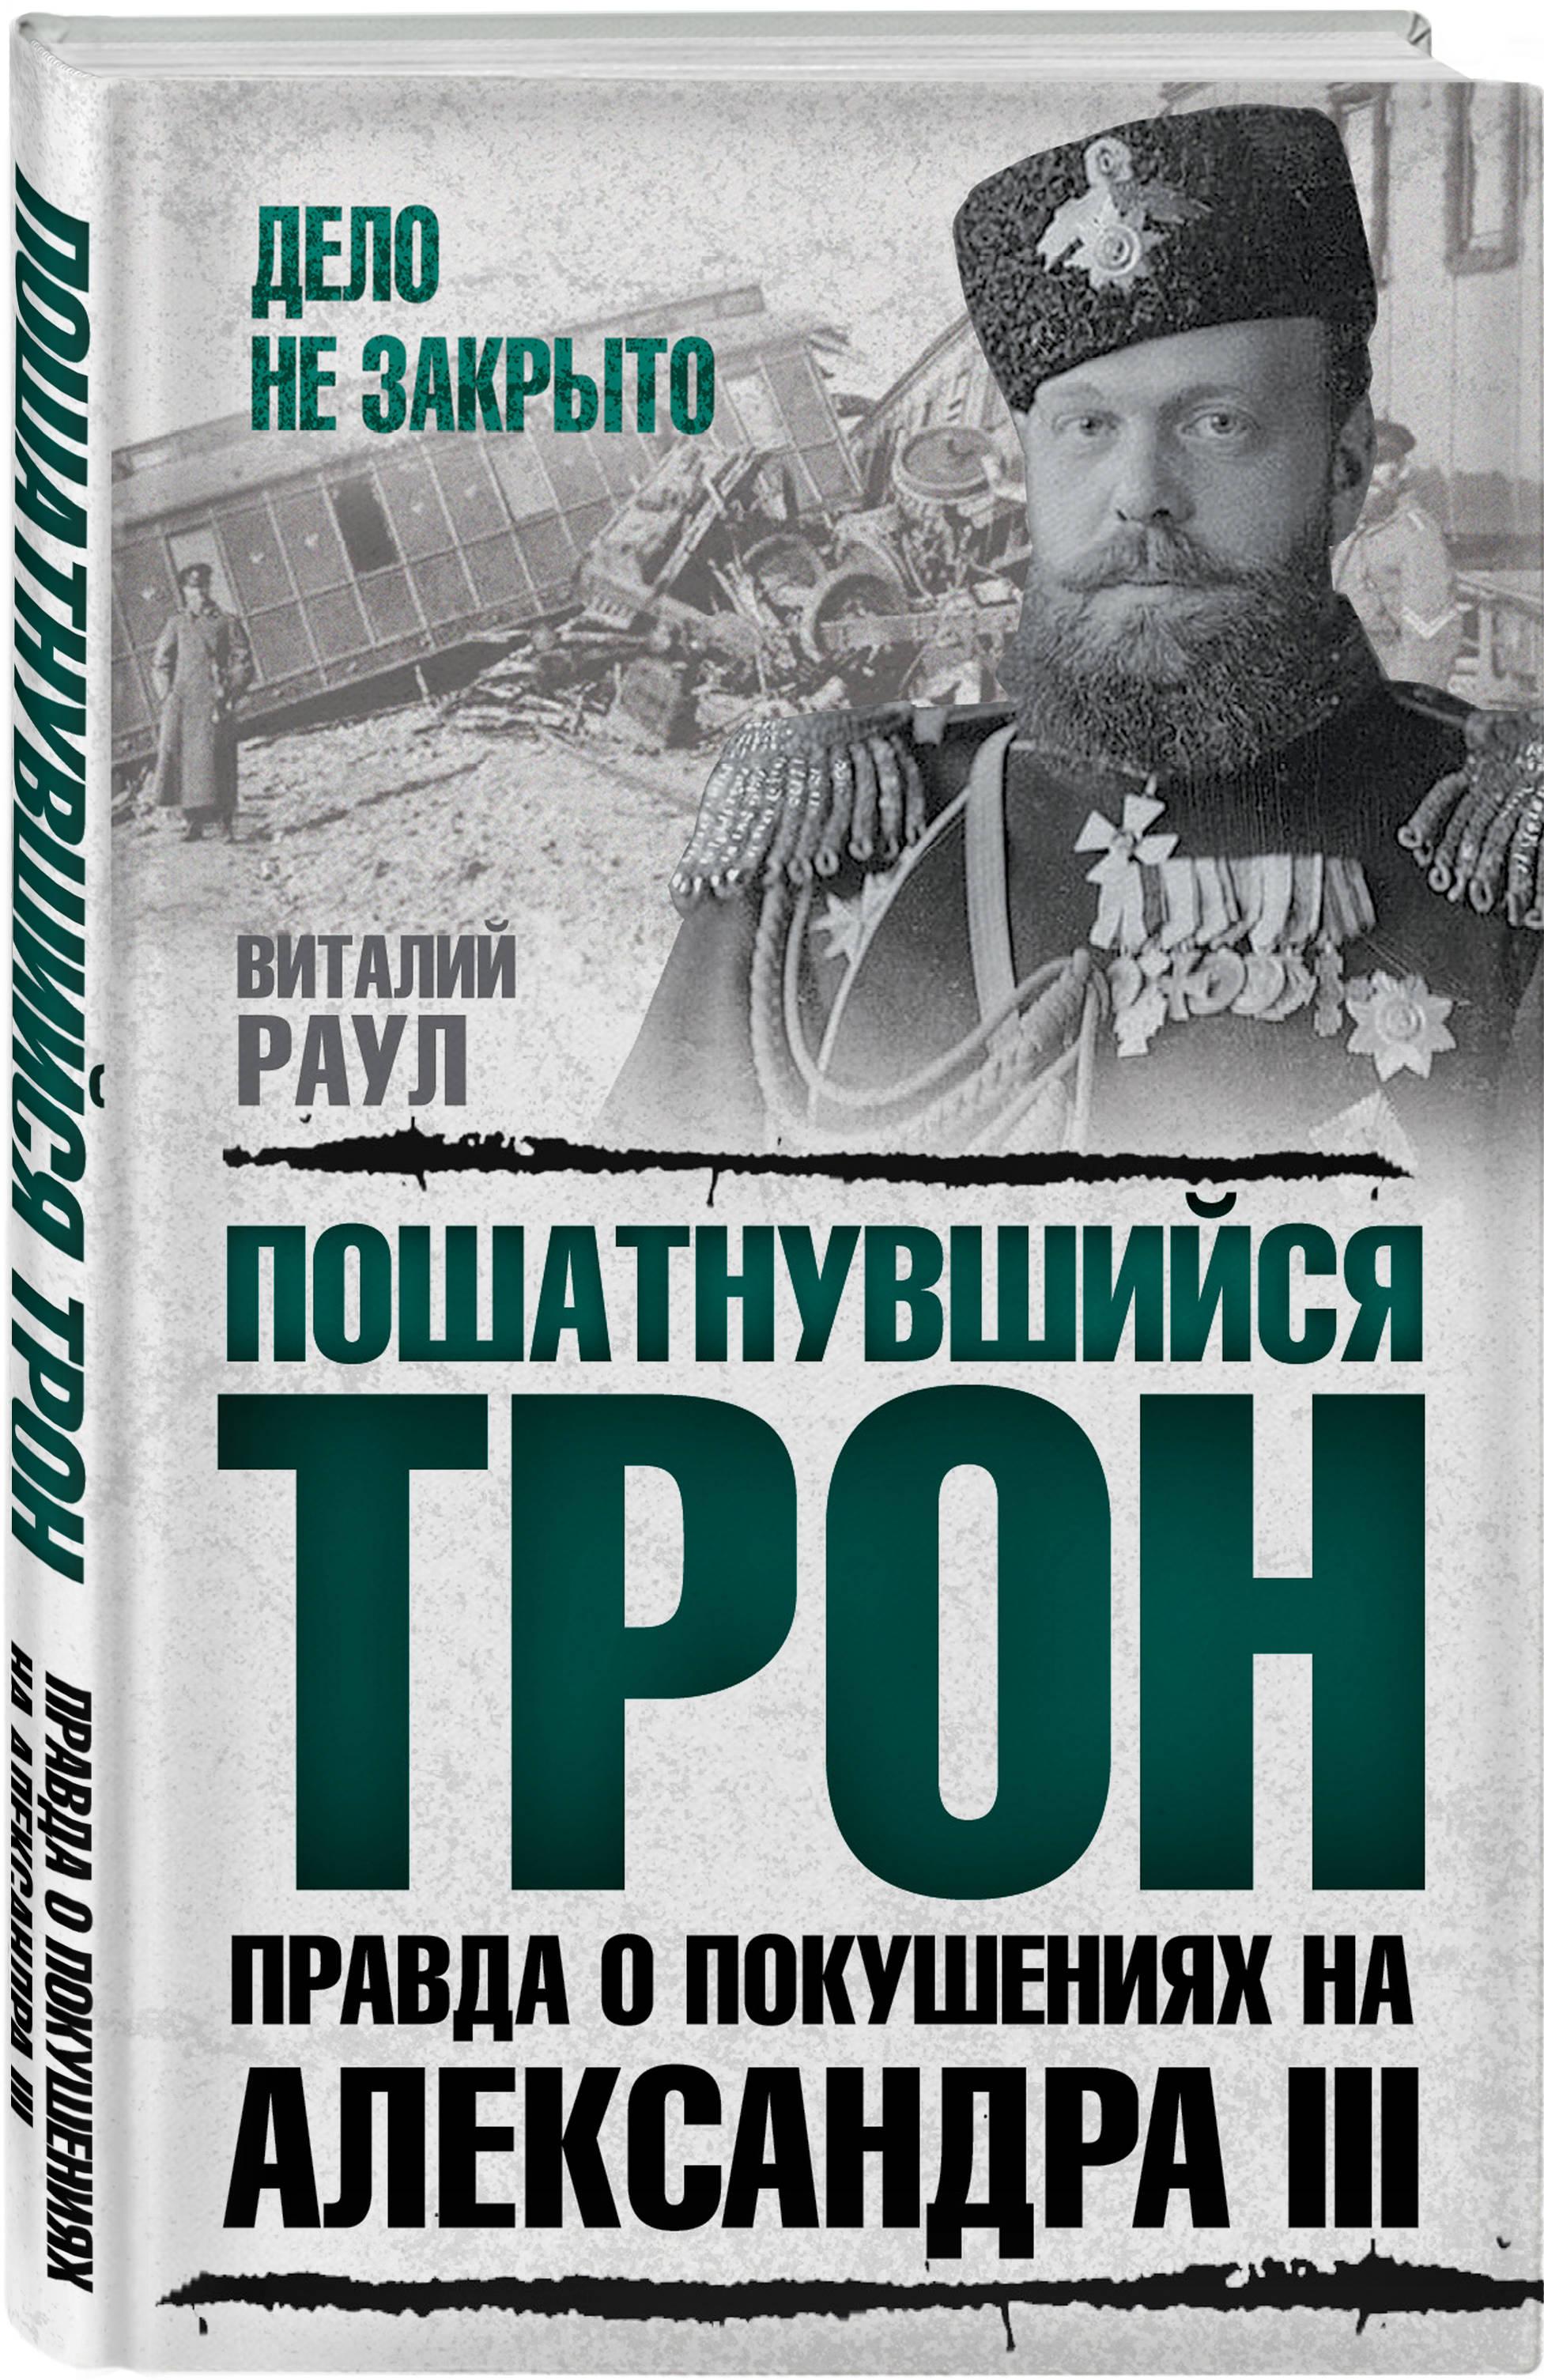 Пошатнувшийся трон. Правда о покушениях на Александра III ( Виталий Раул  )